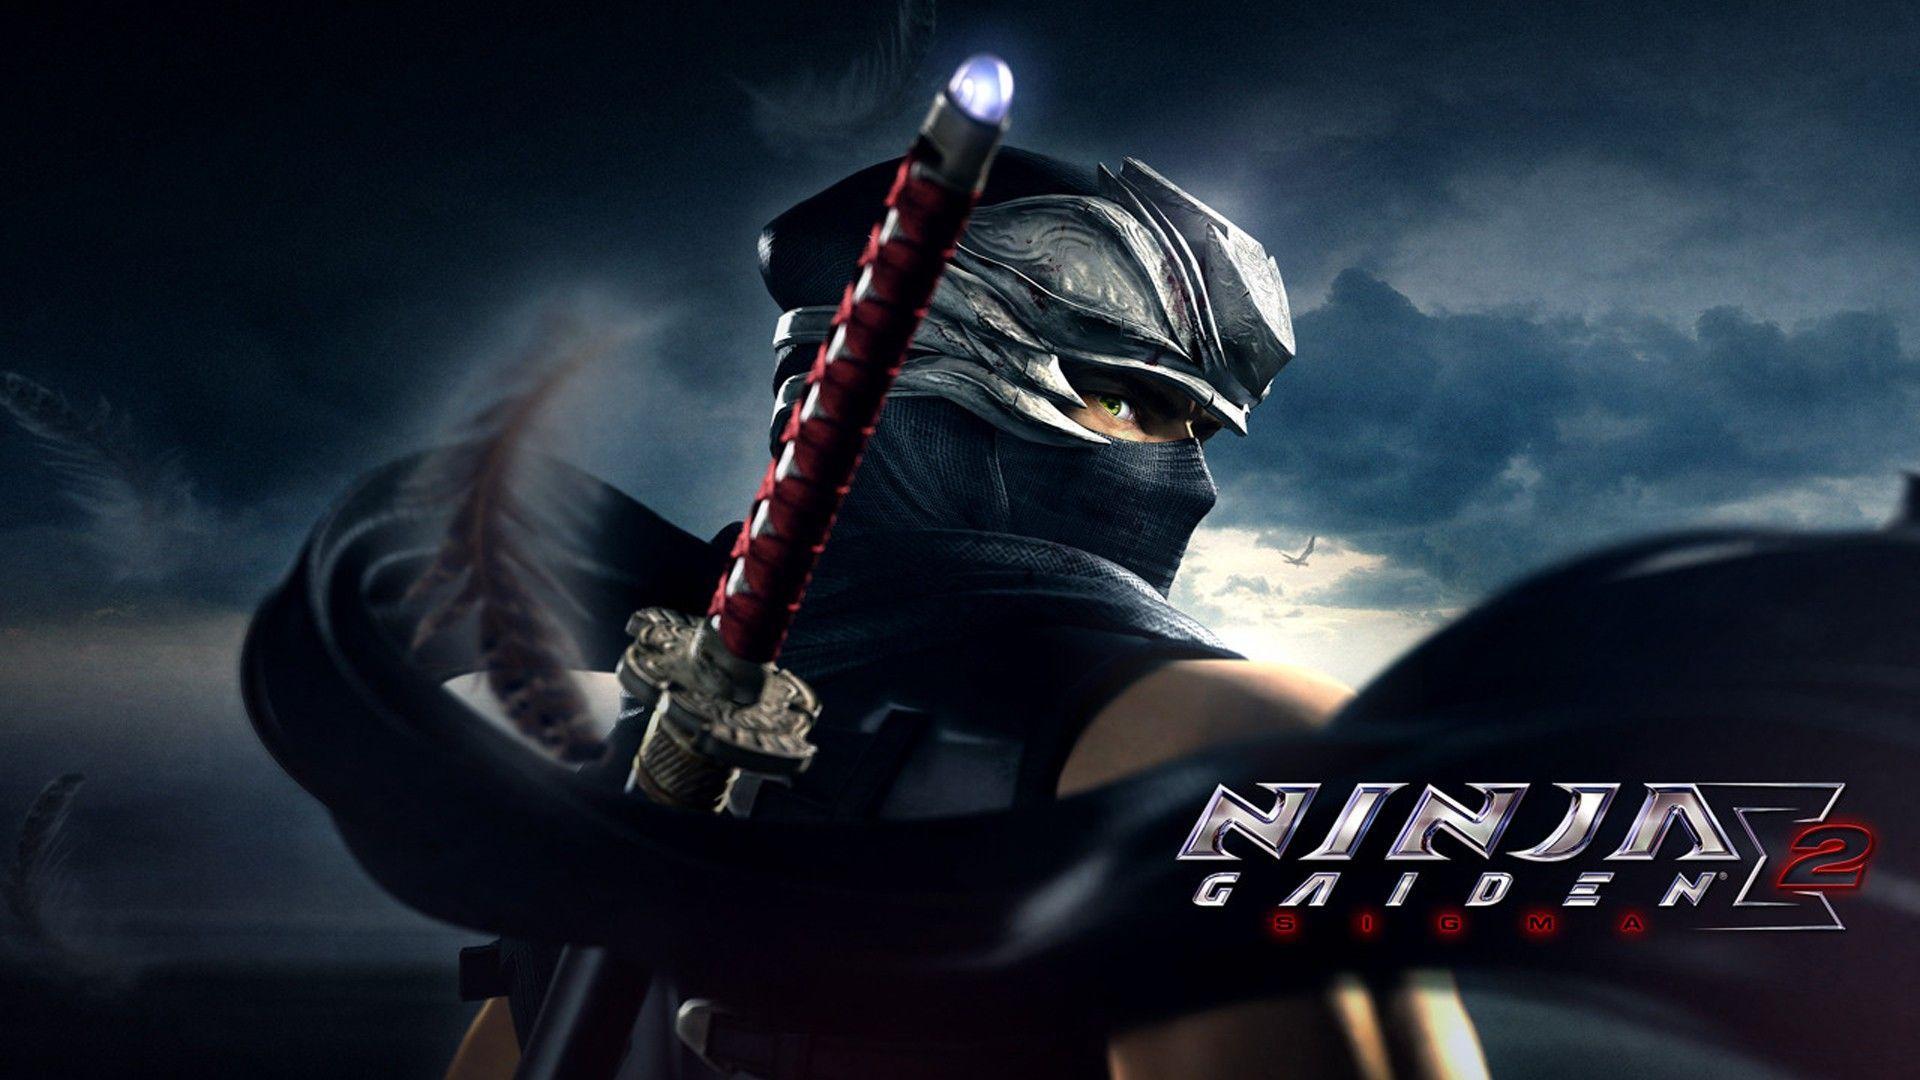 Anime Ninja Assassin Wallpapers Top Free Anime Ninja Assassin